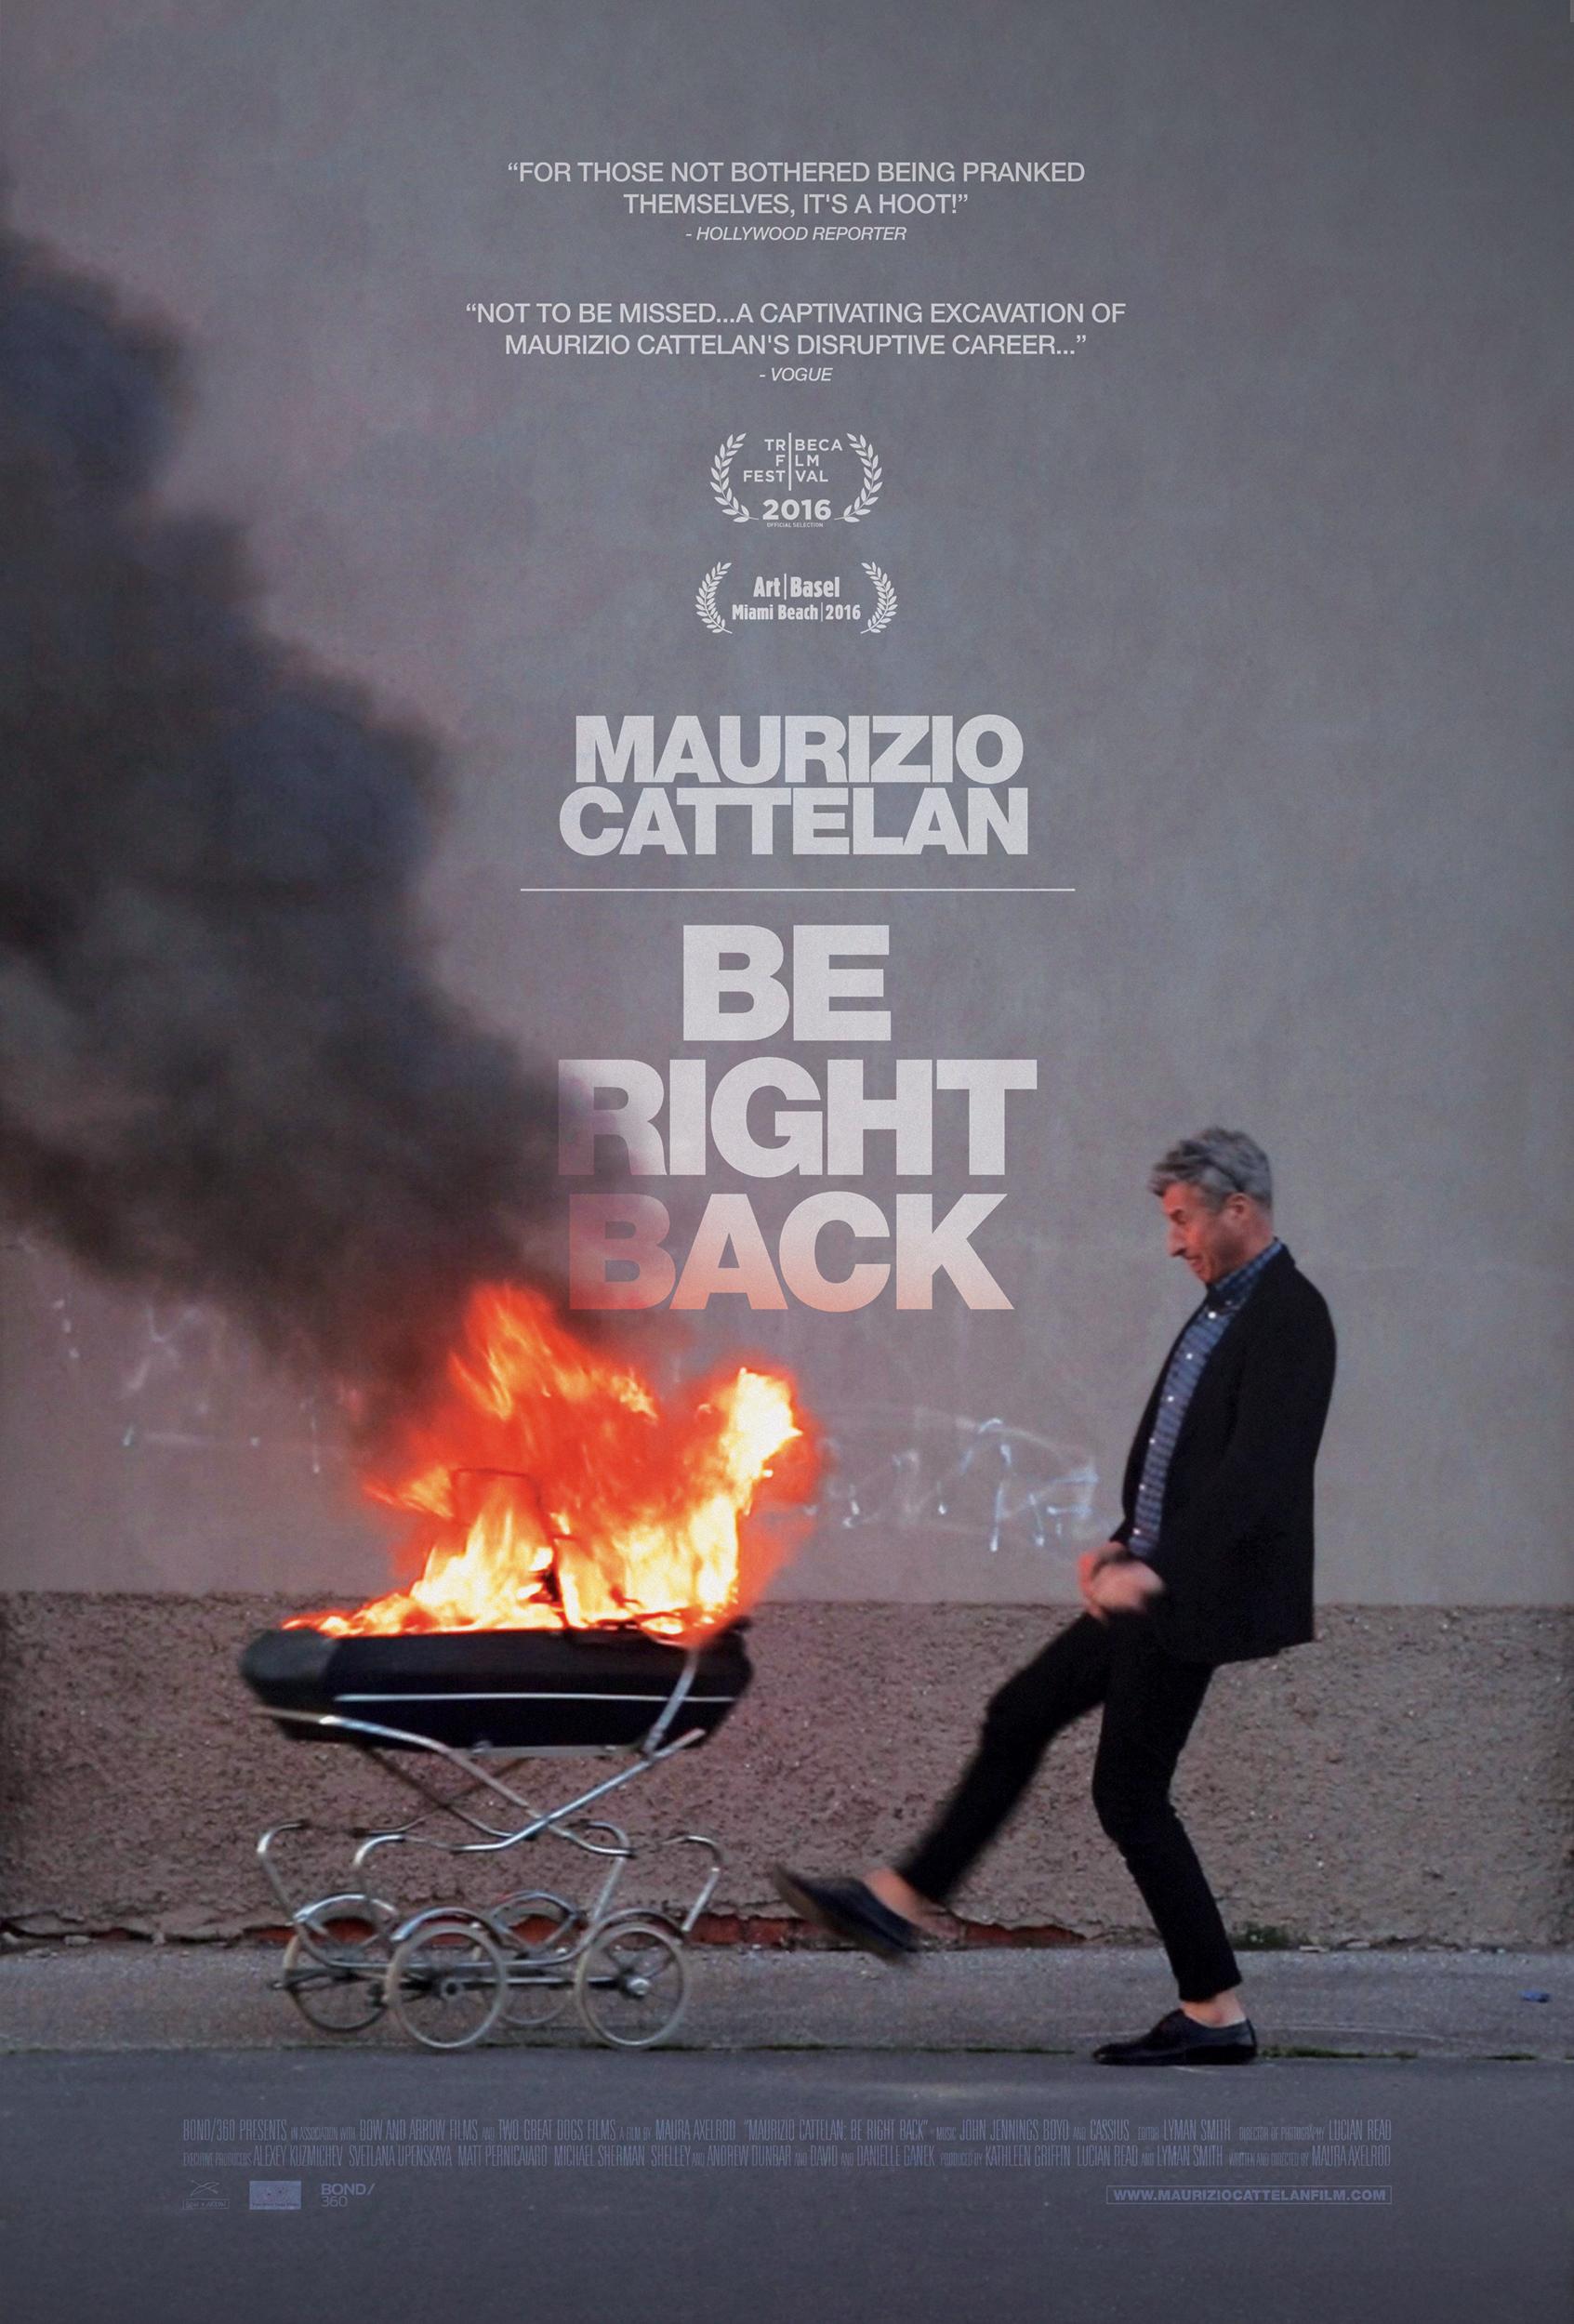 maurizio cattelan be right back 2016 imdb